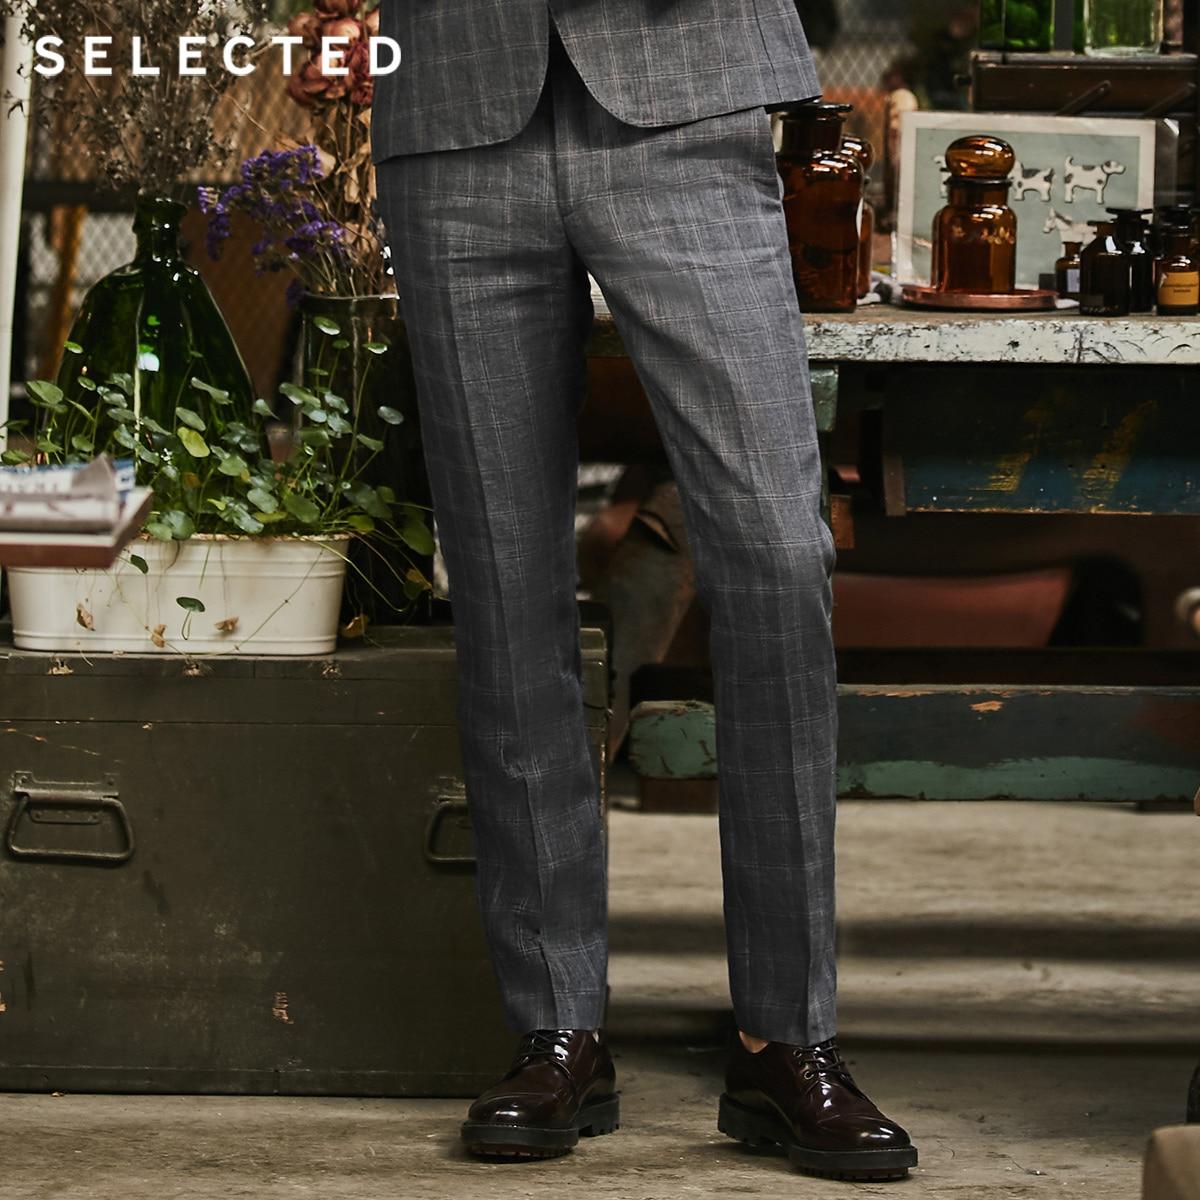 GESELECTEERDE Vlas check business leisure slim pak broek S  418218506-in Broek pak van Mannenkleding op AliExpress - 11.11_Dubbel 11Vrijgezellendag 1